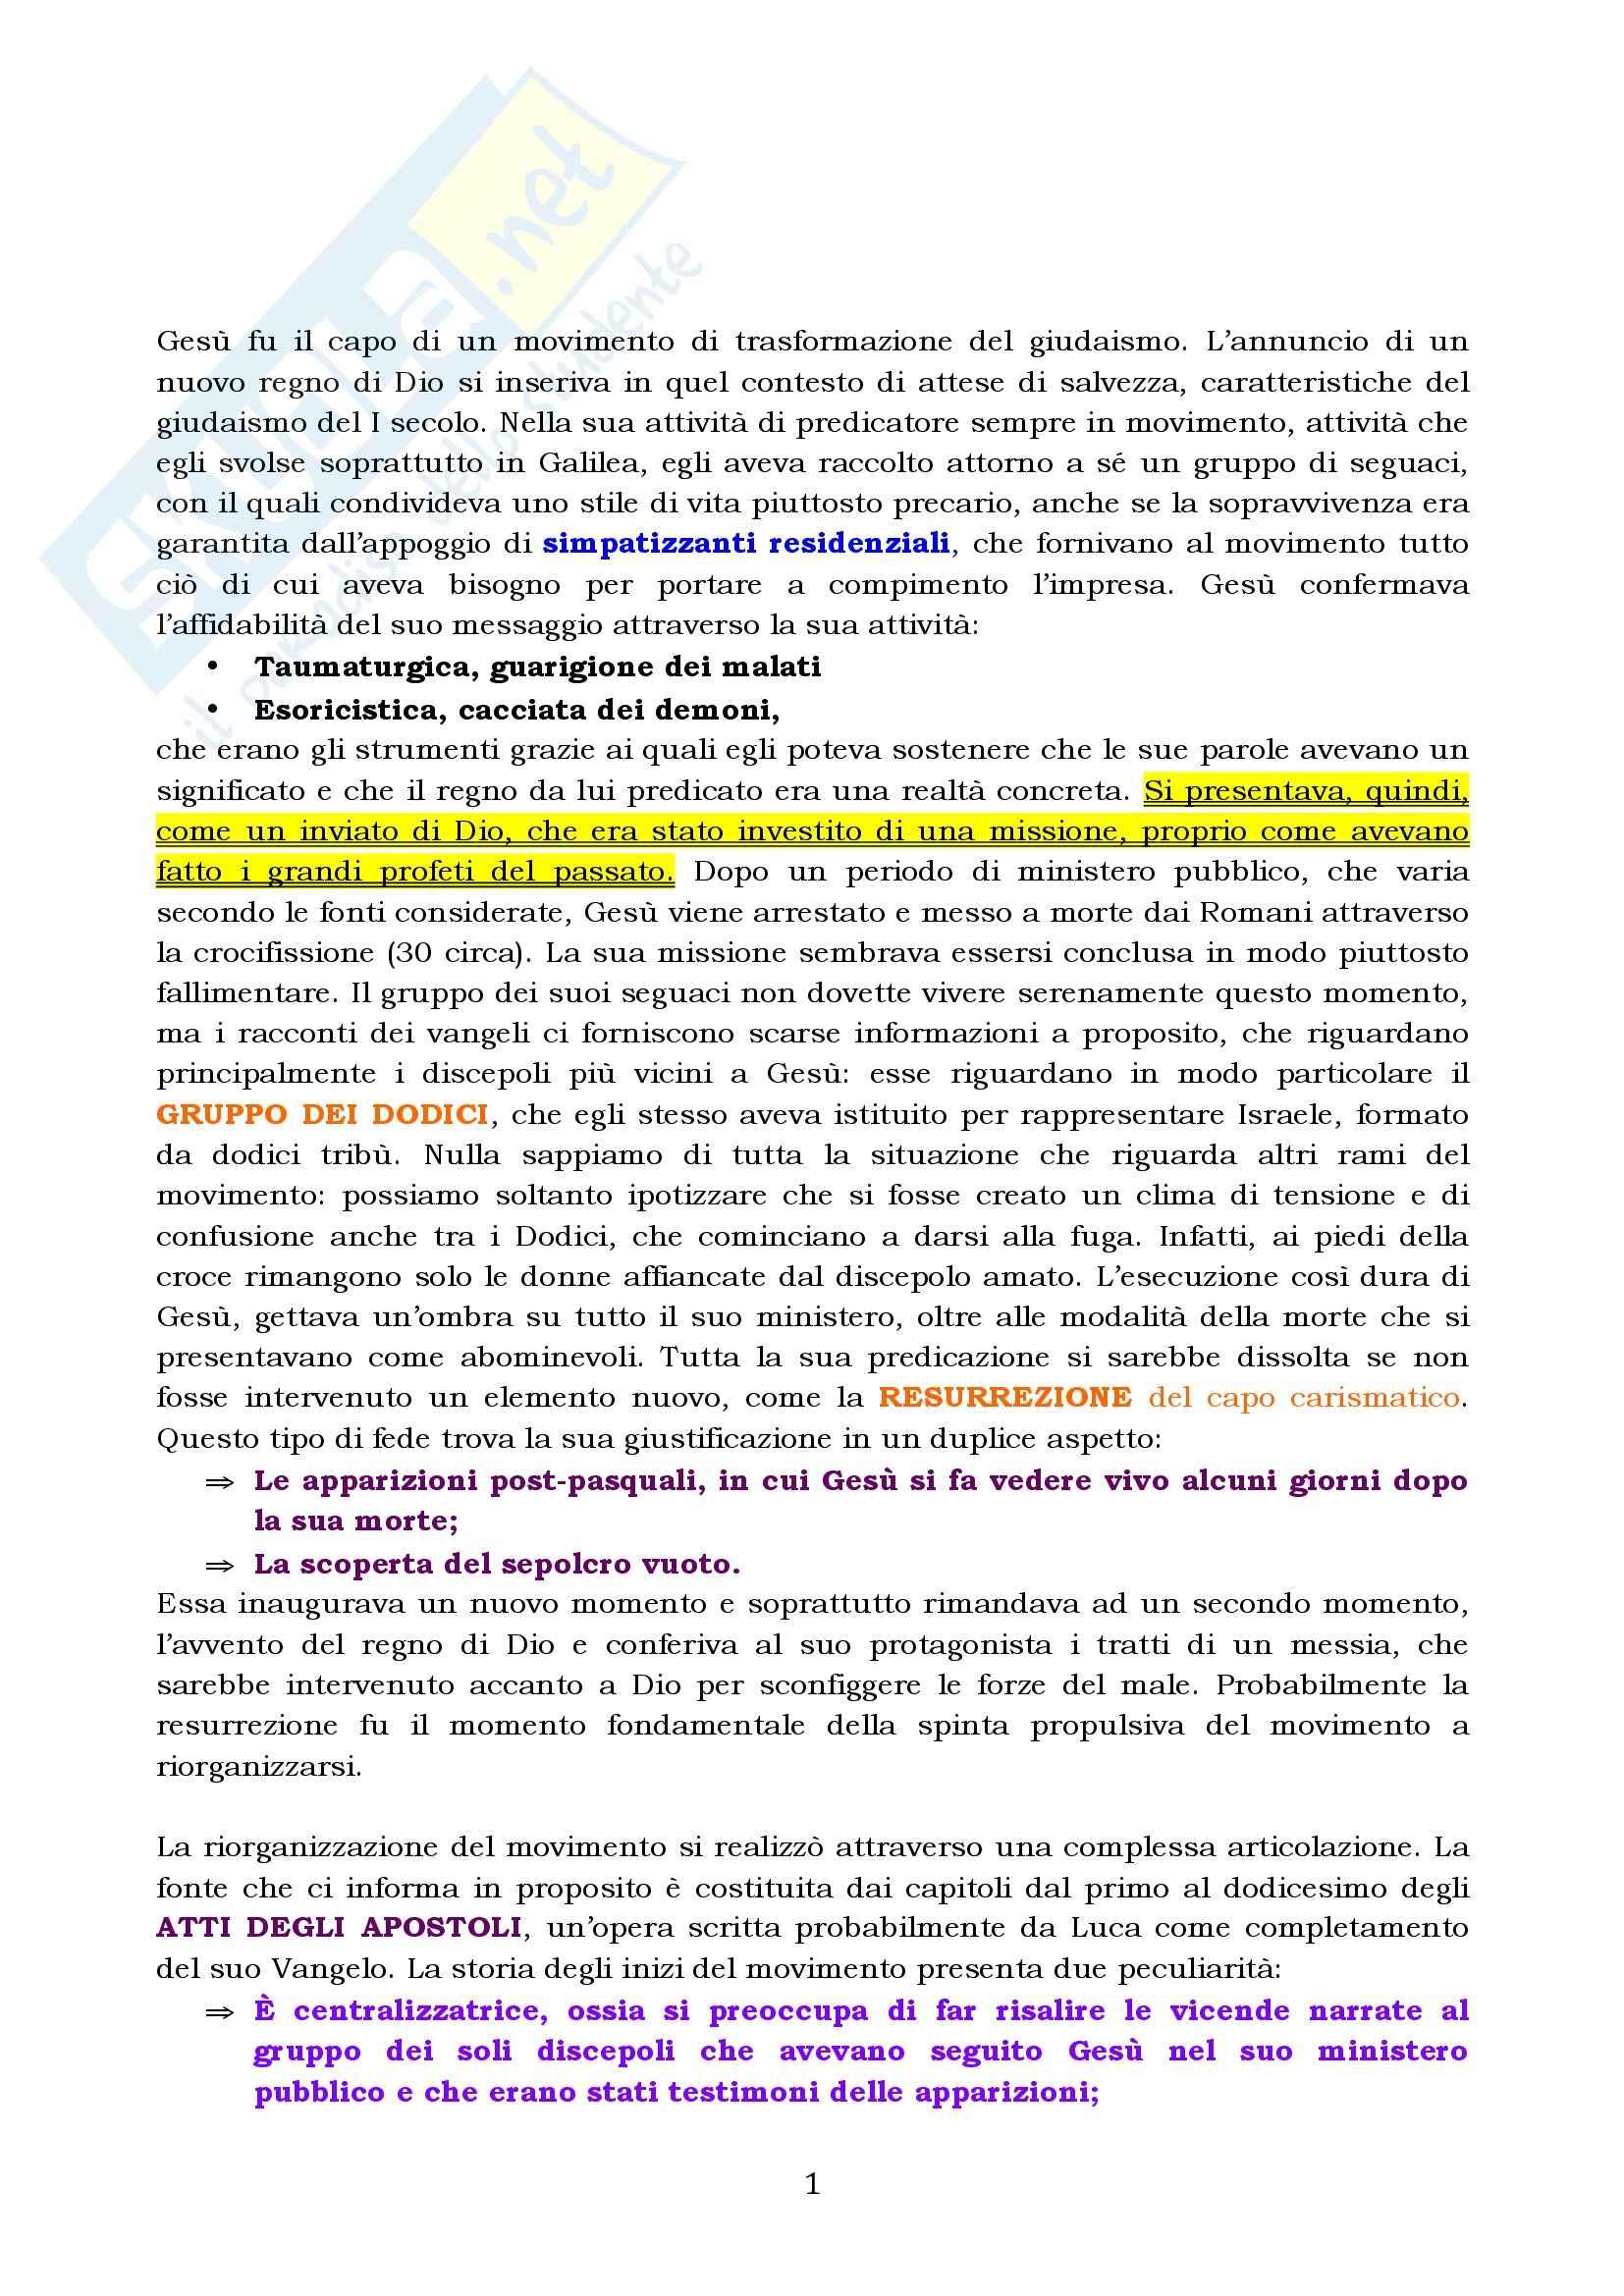 Riassunto esame Storia del cristianesimo, prof. Colombi, libro consigliato I Vangeli apocrifi, Gianotto